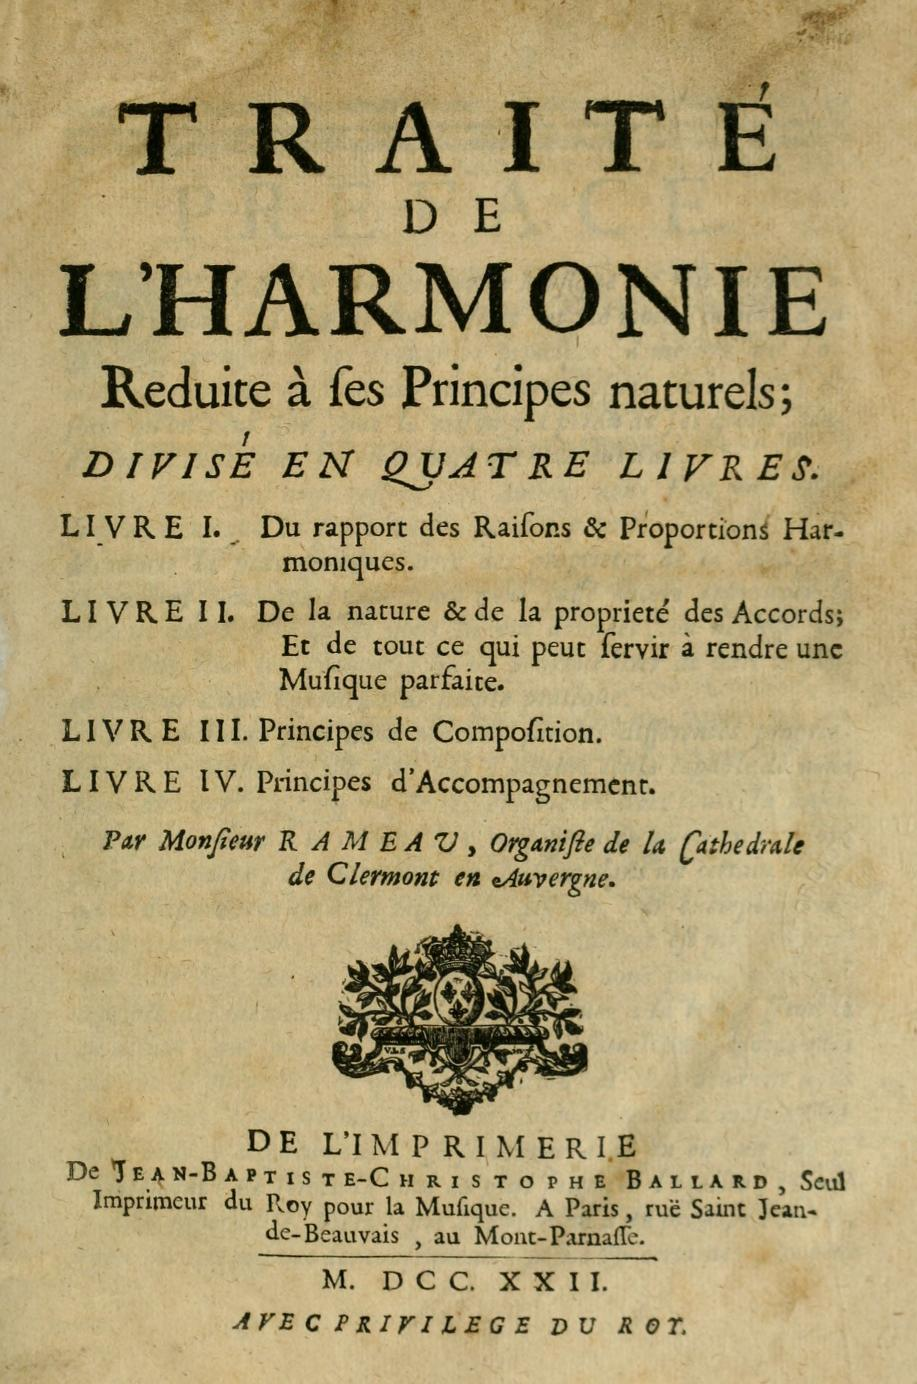 Rameau Traite de l%E2%80%99harmonie.jpg